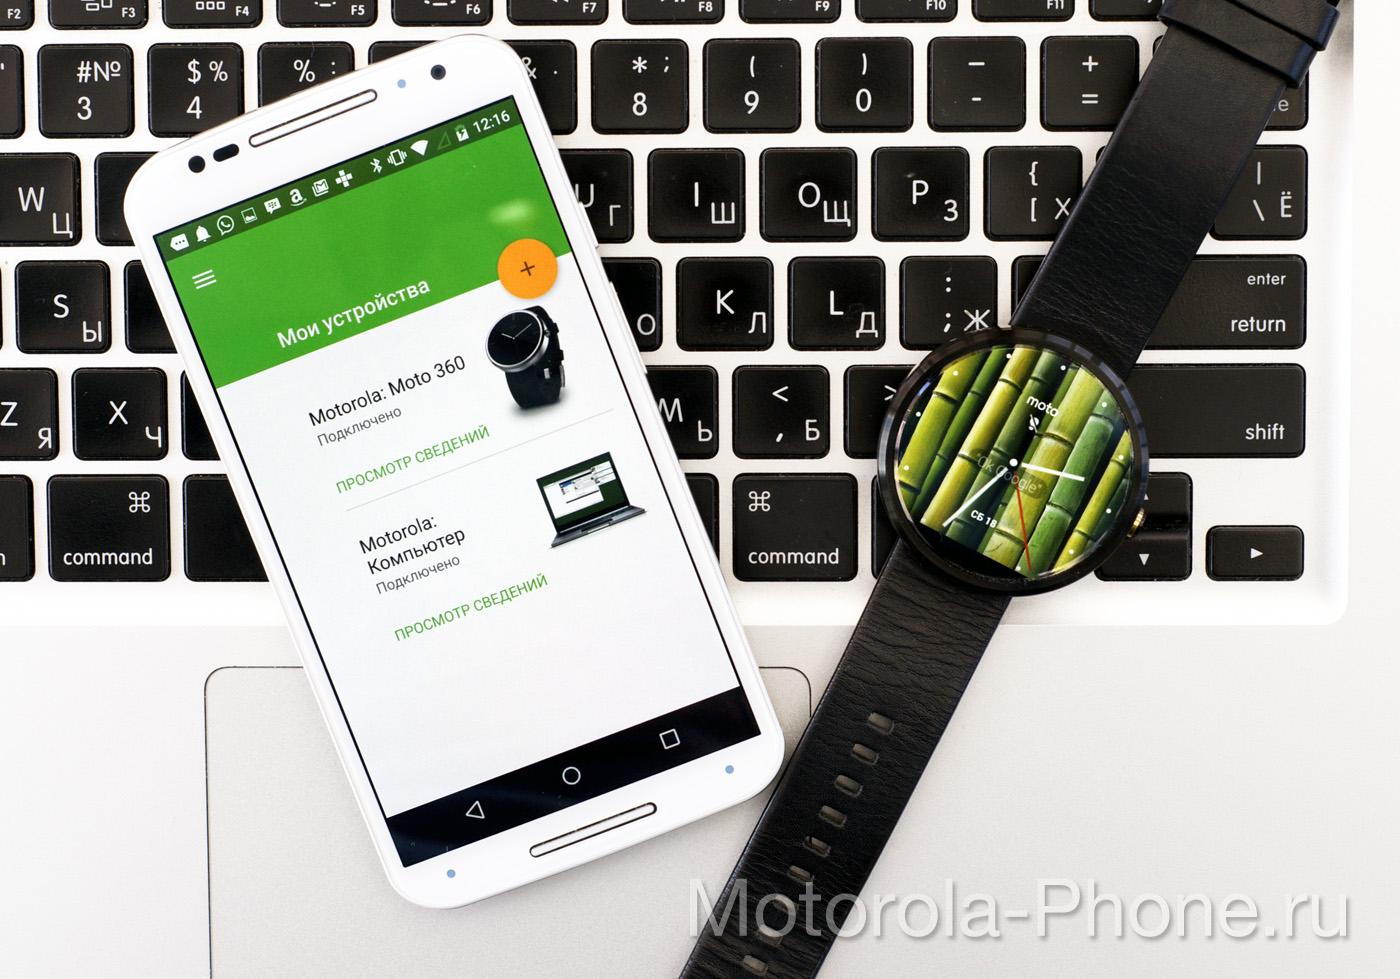 Motorola-Moto-Connect-7